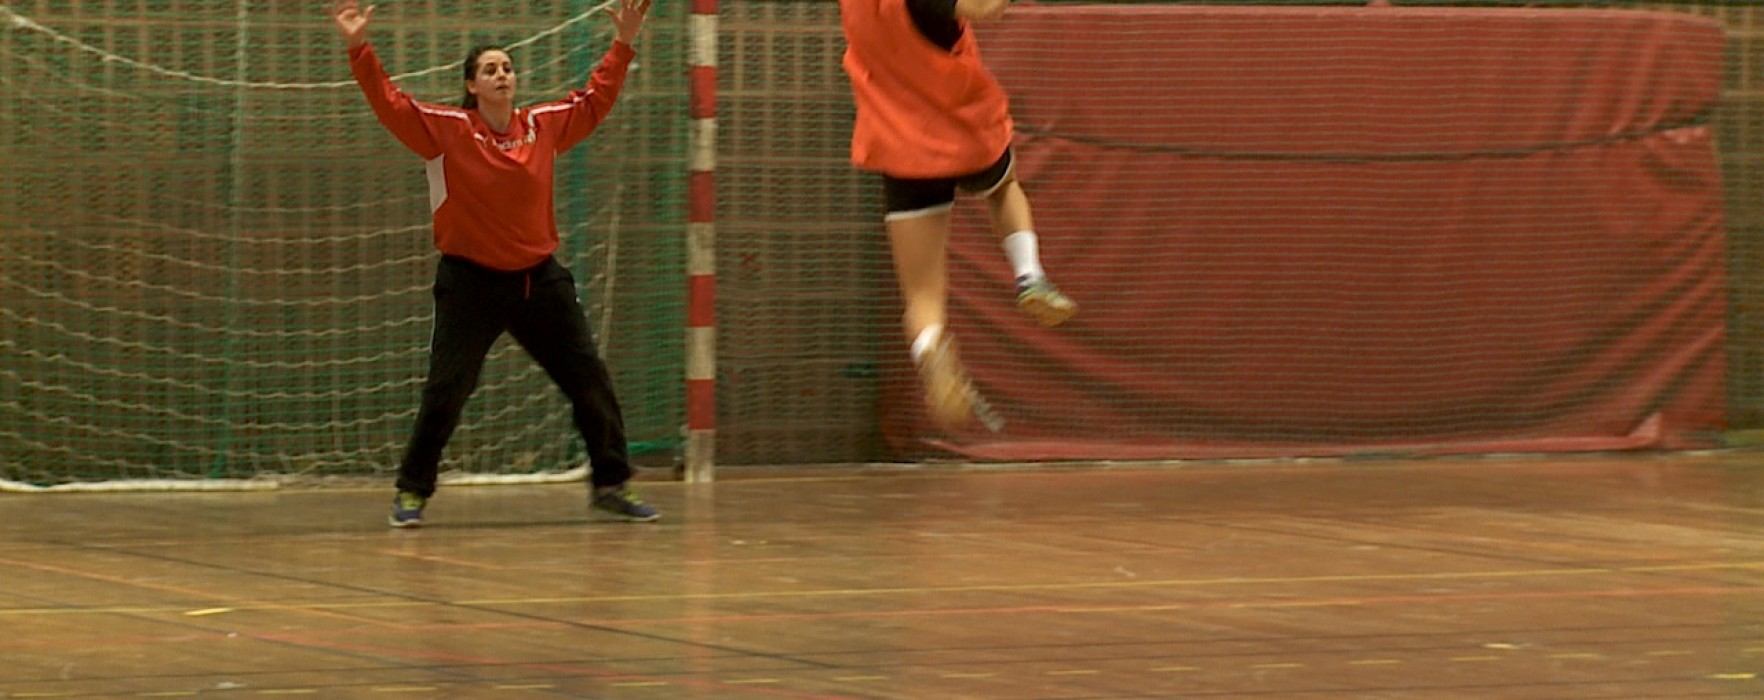 Glimt Sport – Annelie Larsson och Robert Sundberg